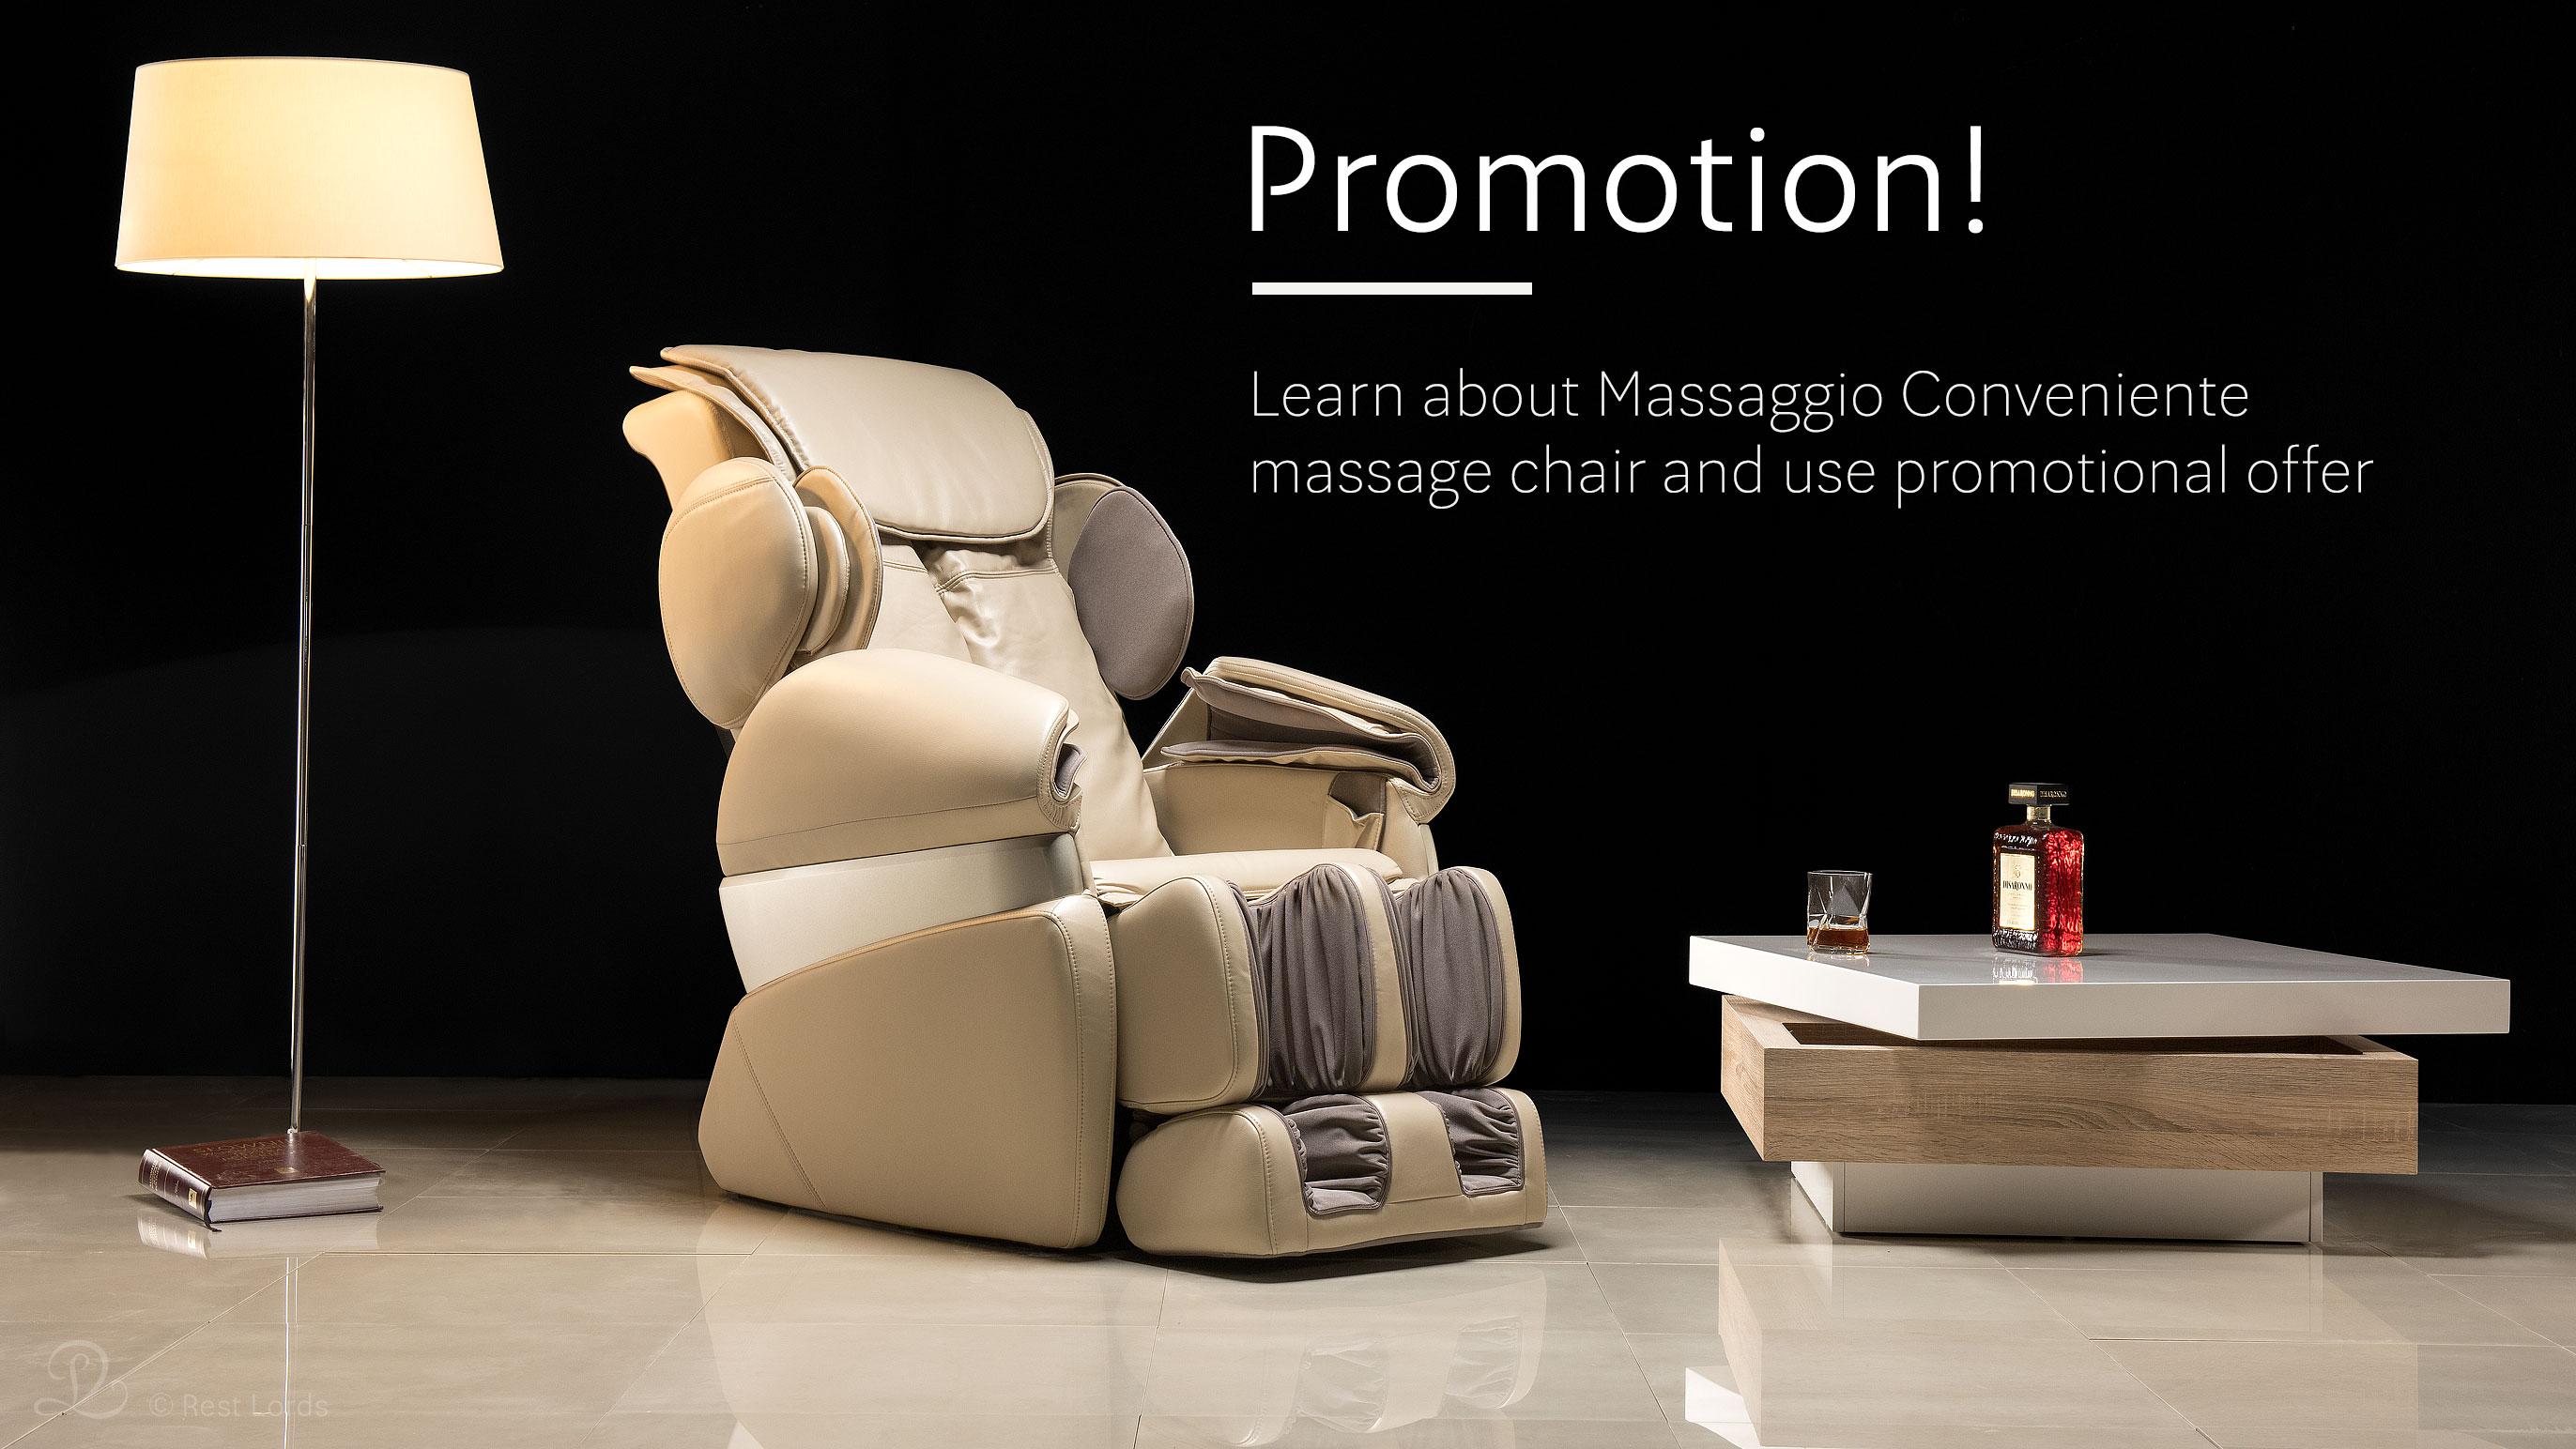 Massage chair Massaggio Conveniente on sale promotion